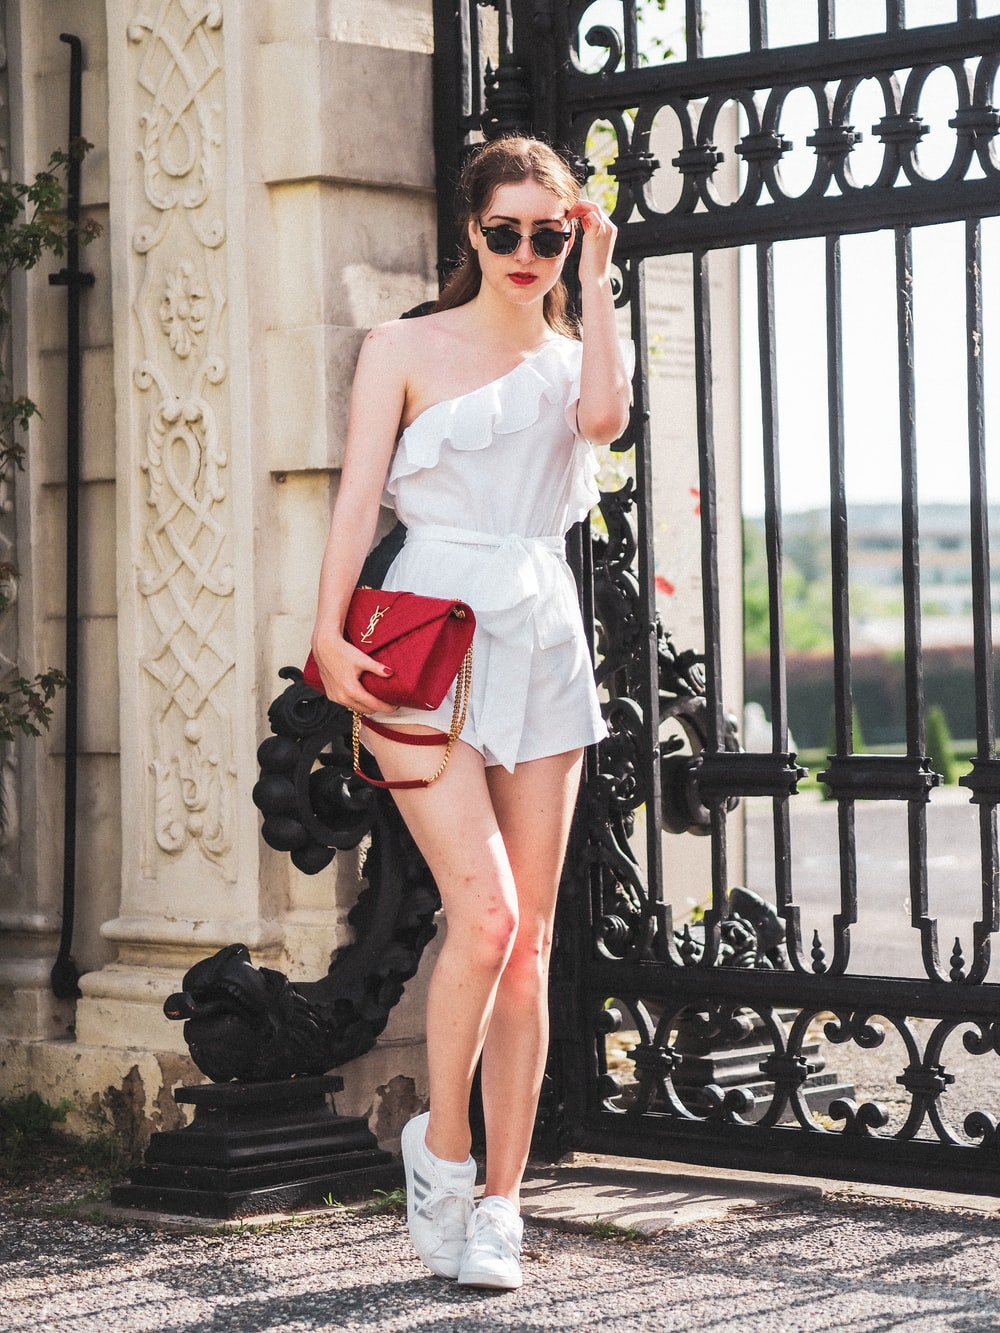 woman in white sleeveless dress wearing sunglasses standing near black metal gate during daytime